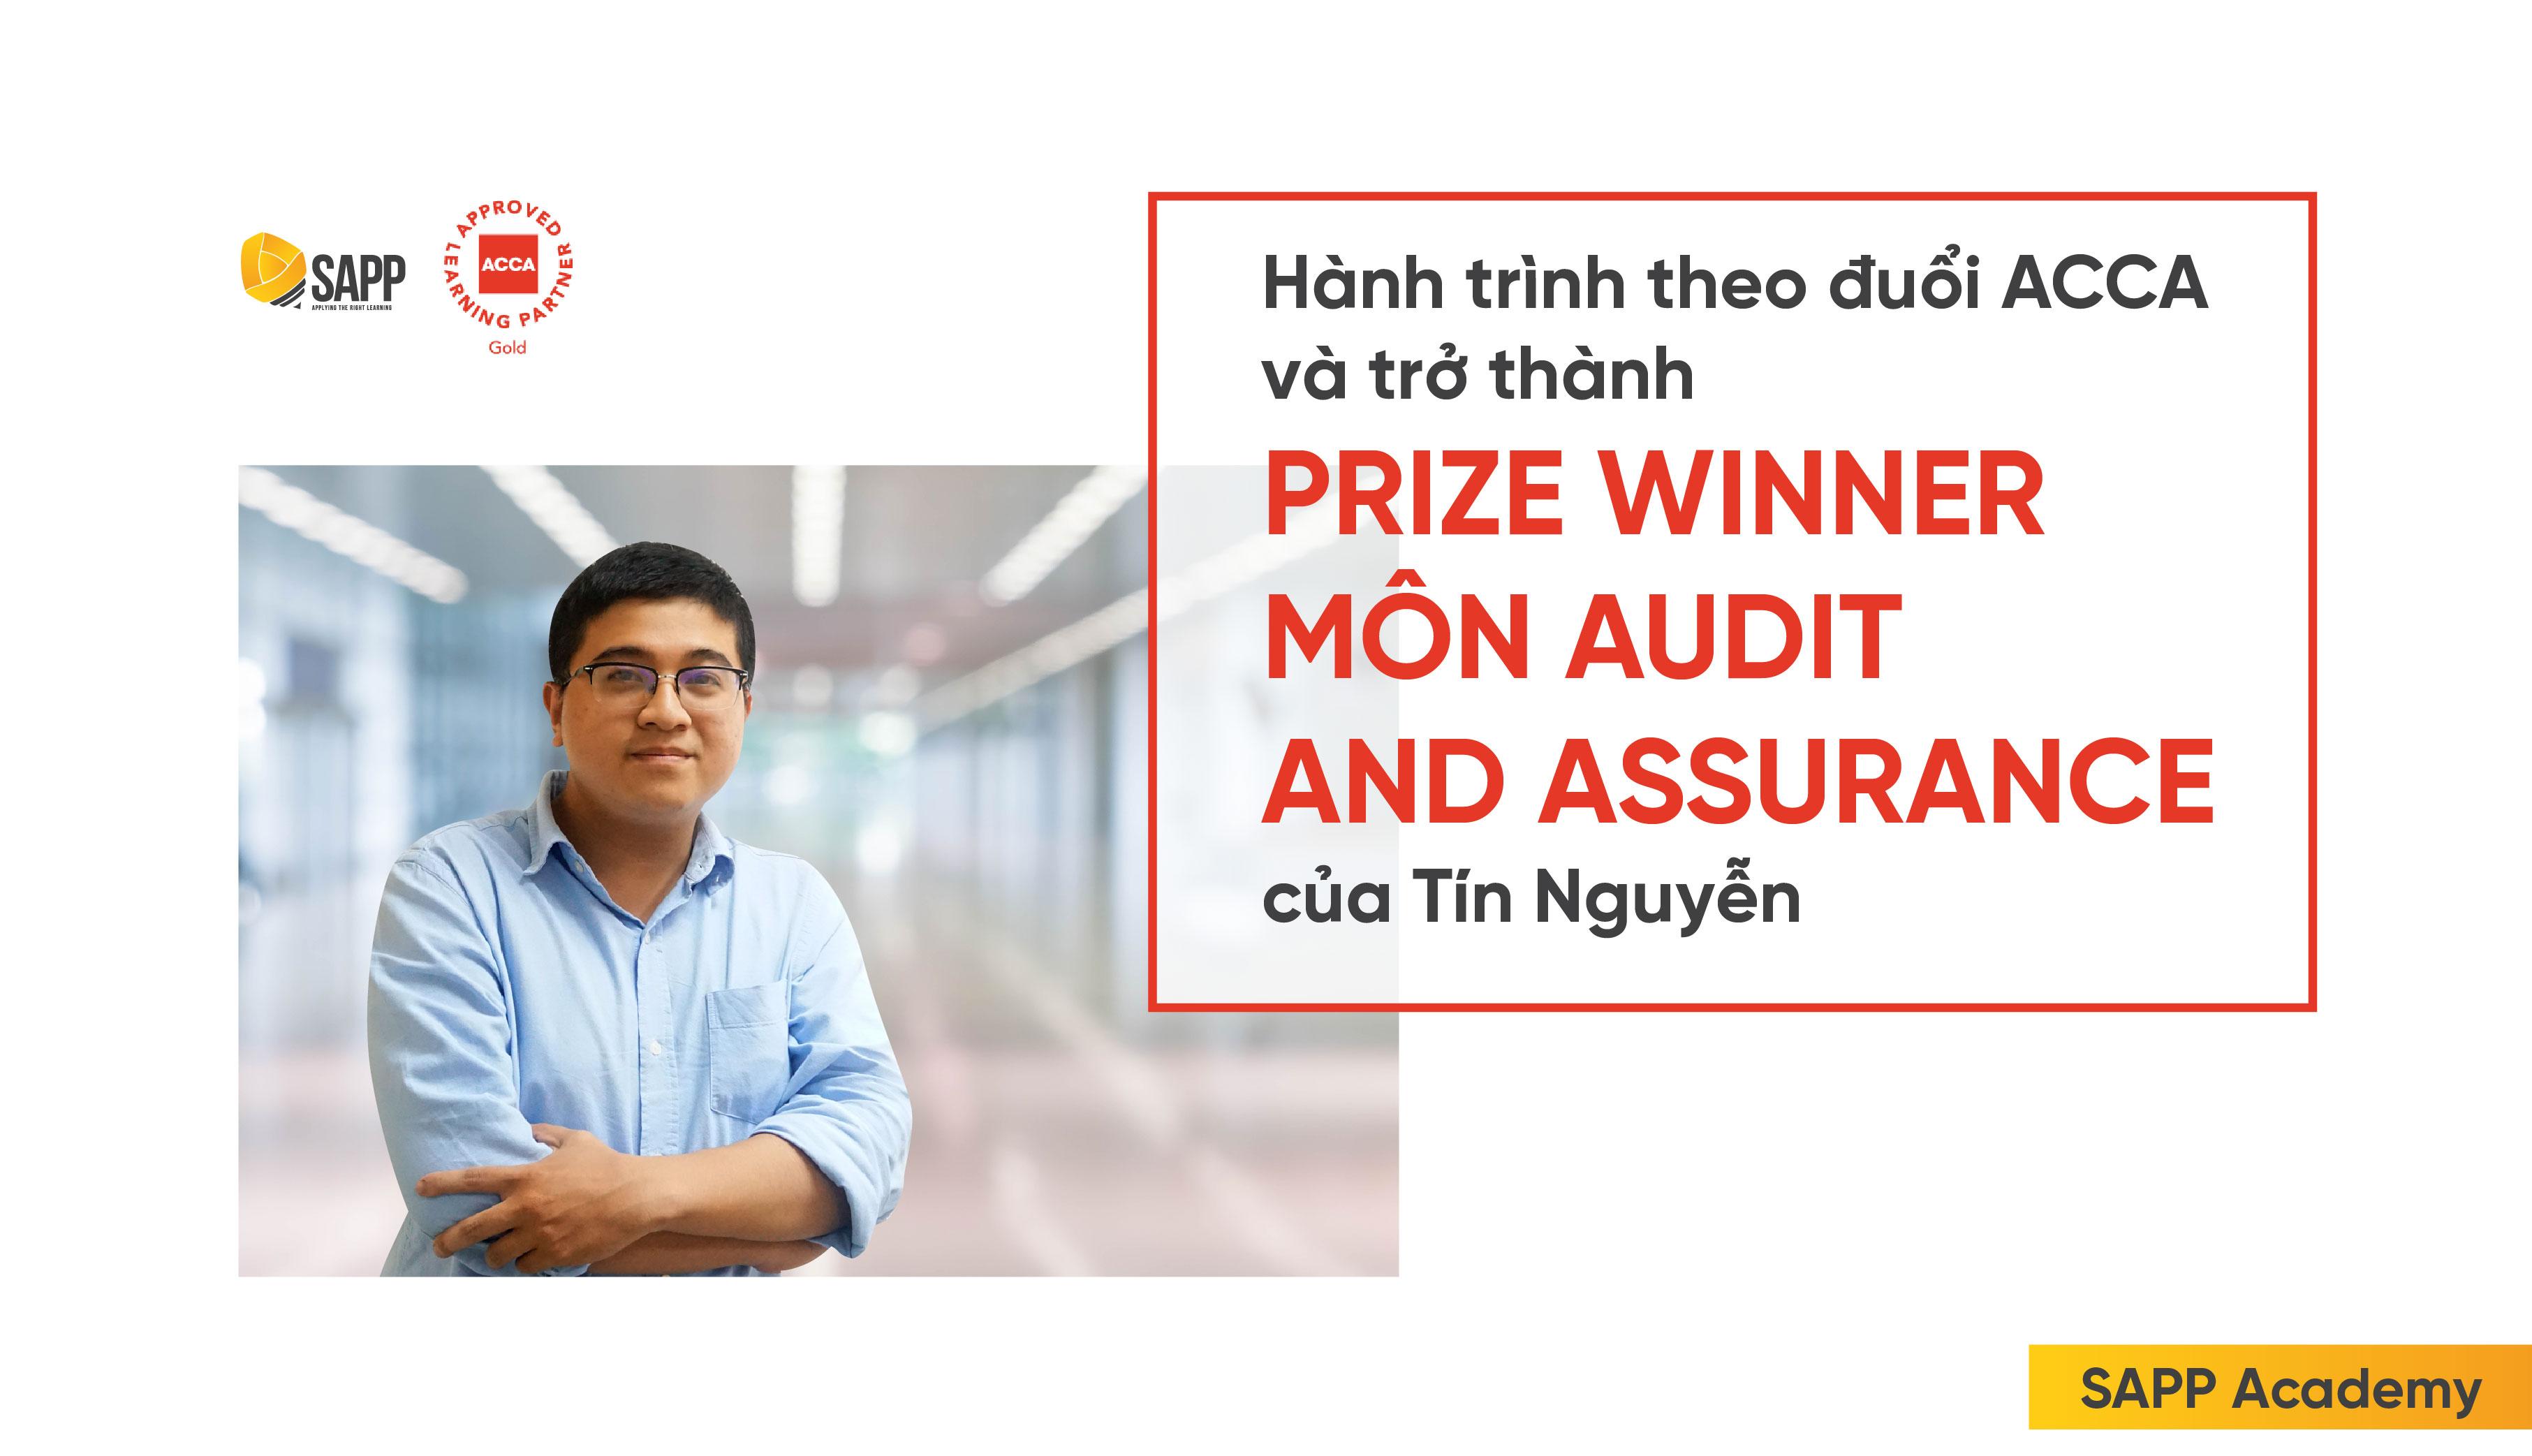 Prize Winner môn Audit and Assurance Tín Nguyễn